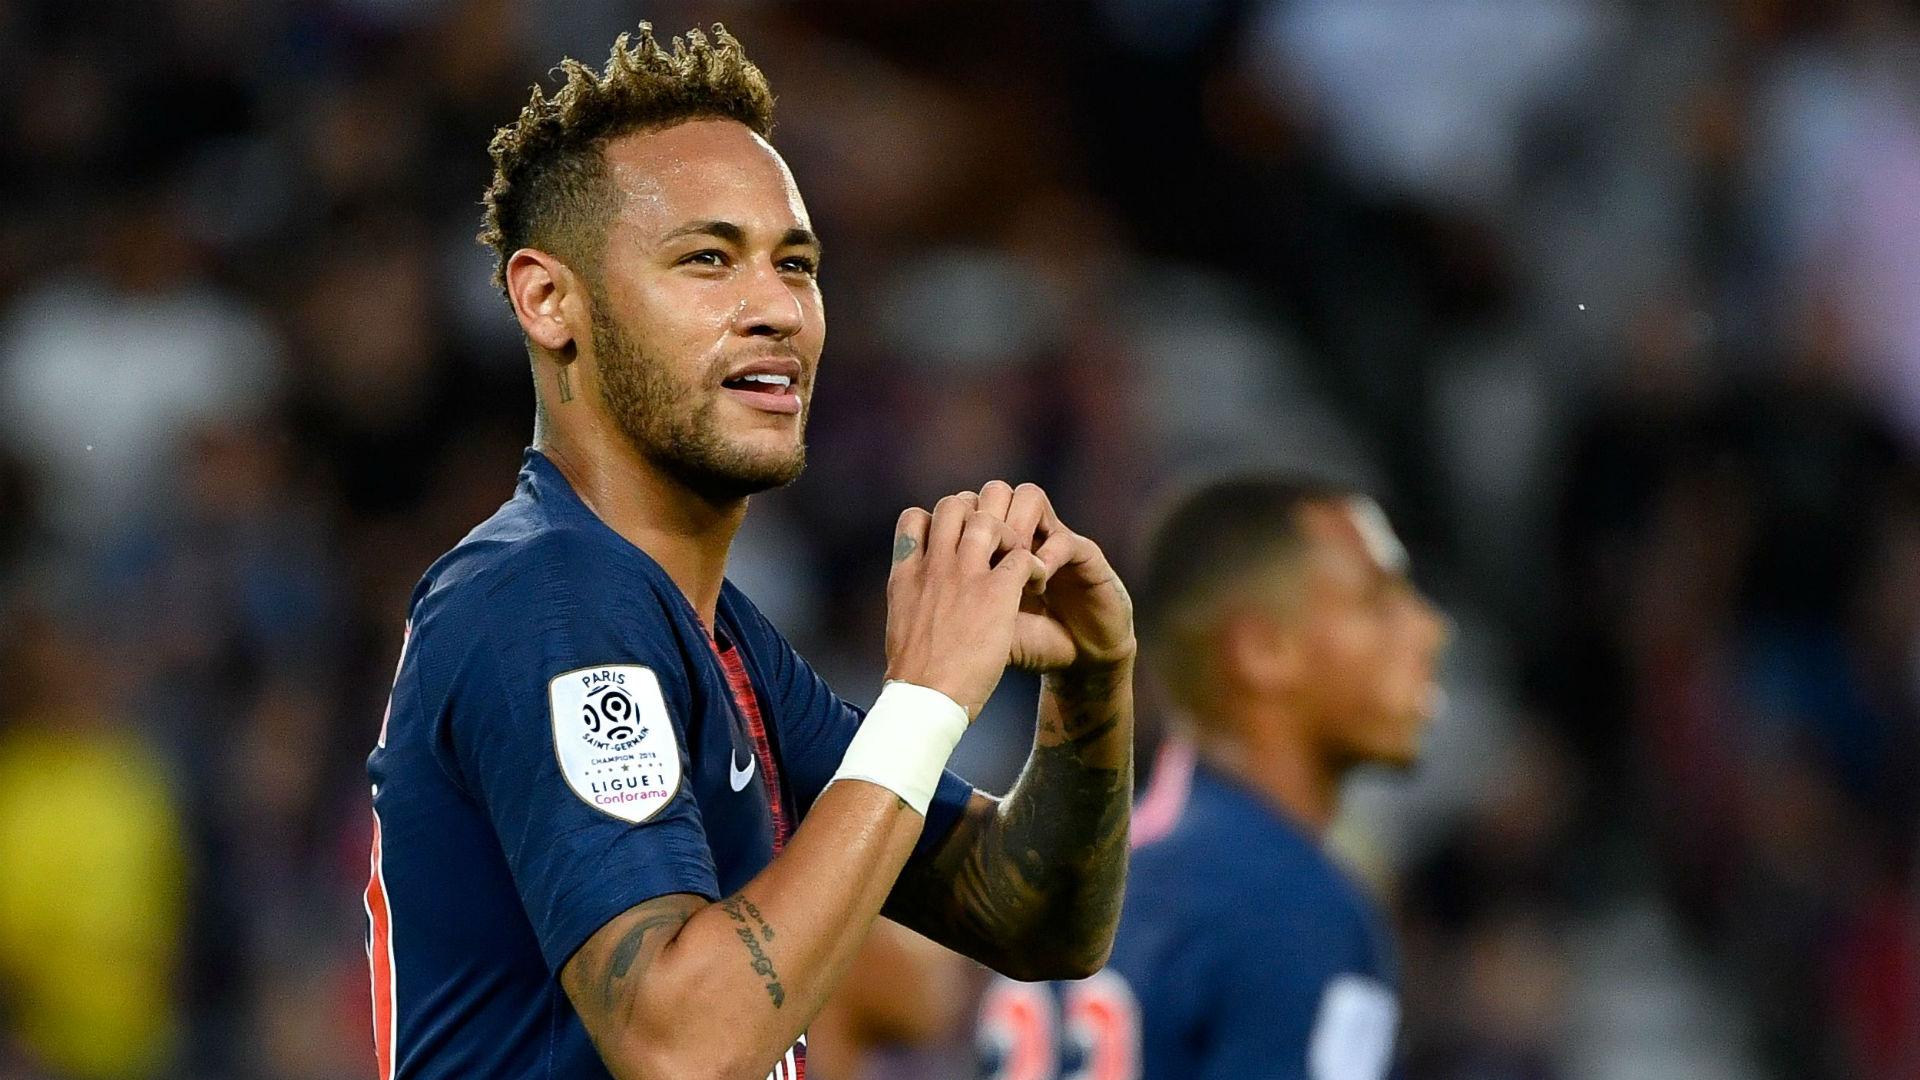 Football, ligue des champions, Neymar, Sports